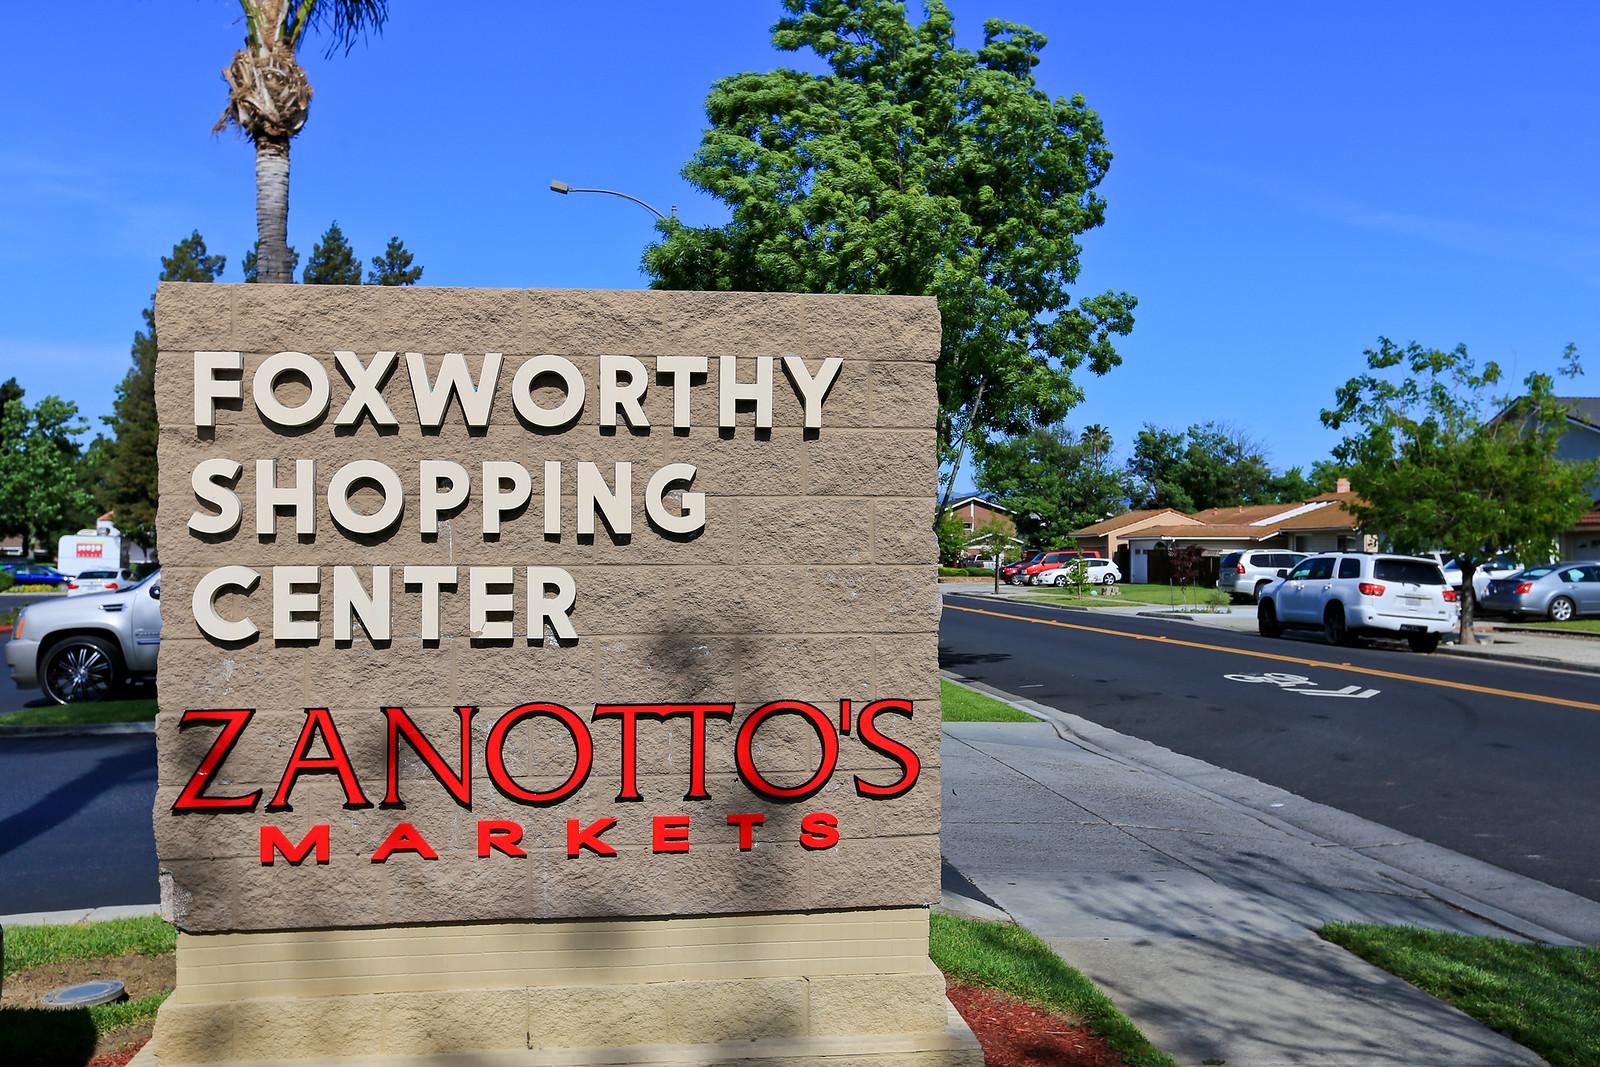 Foxworthy Shopping Center Willow Glen Blu Skye Media-X3.jpg